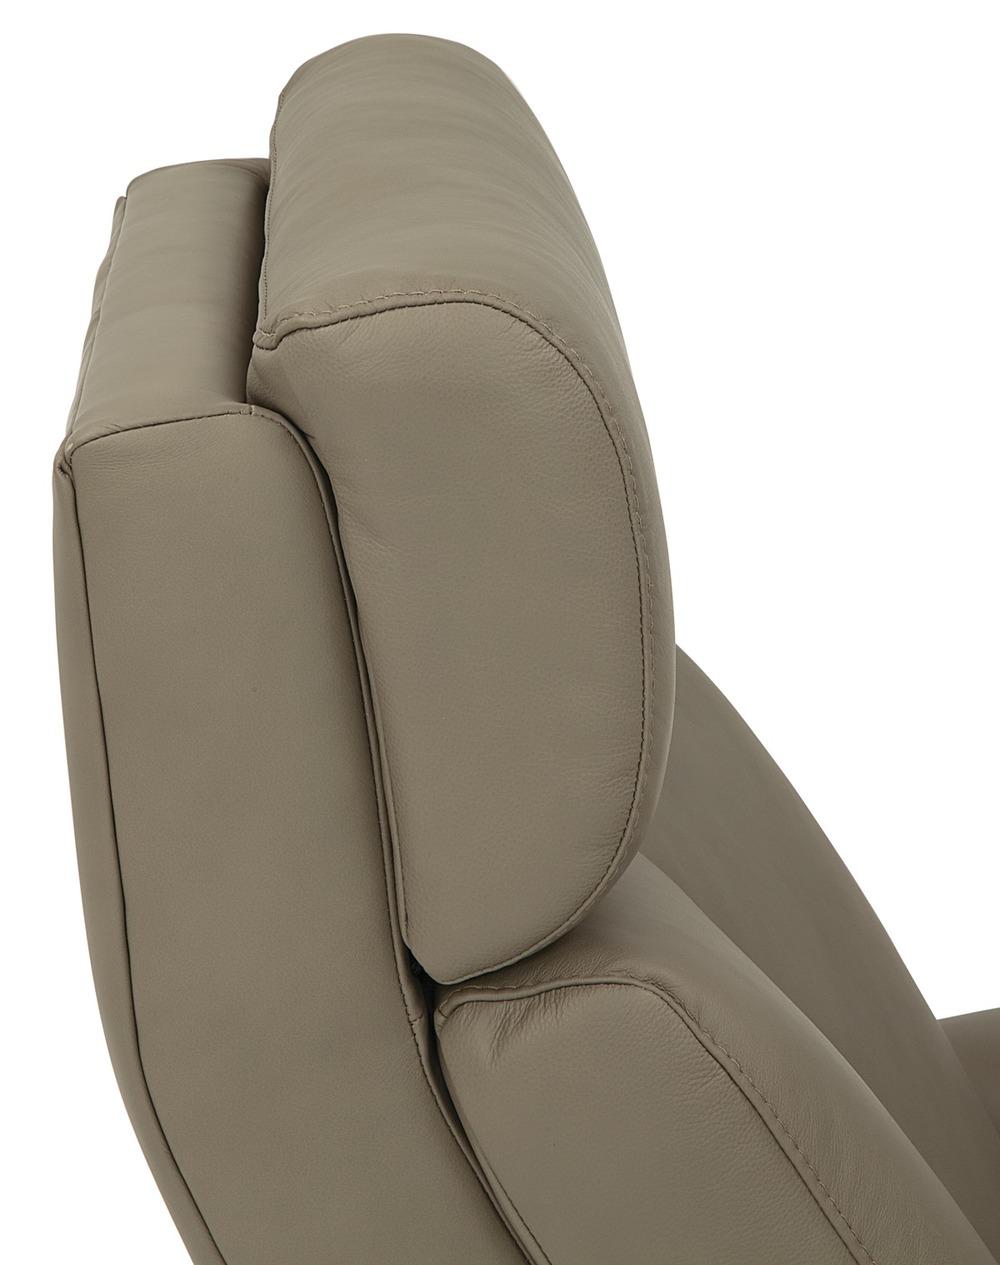 Palliser Furniture - Prodigy II Power Swivel Glider with Power Headrest